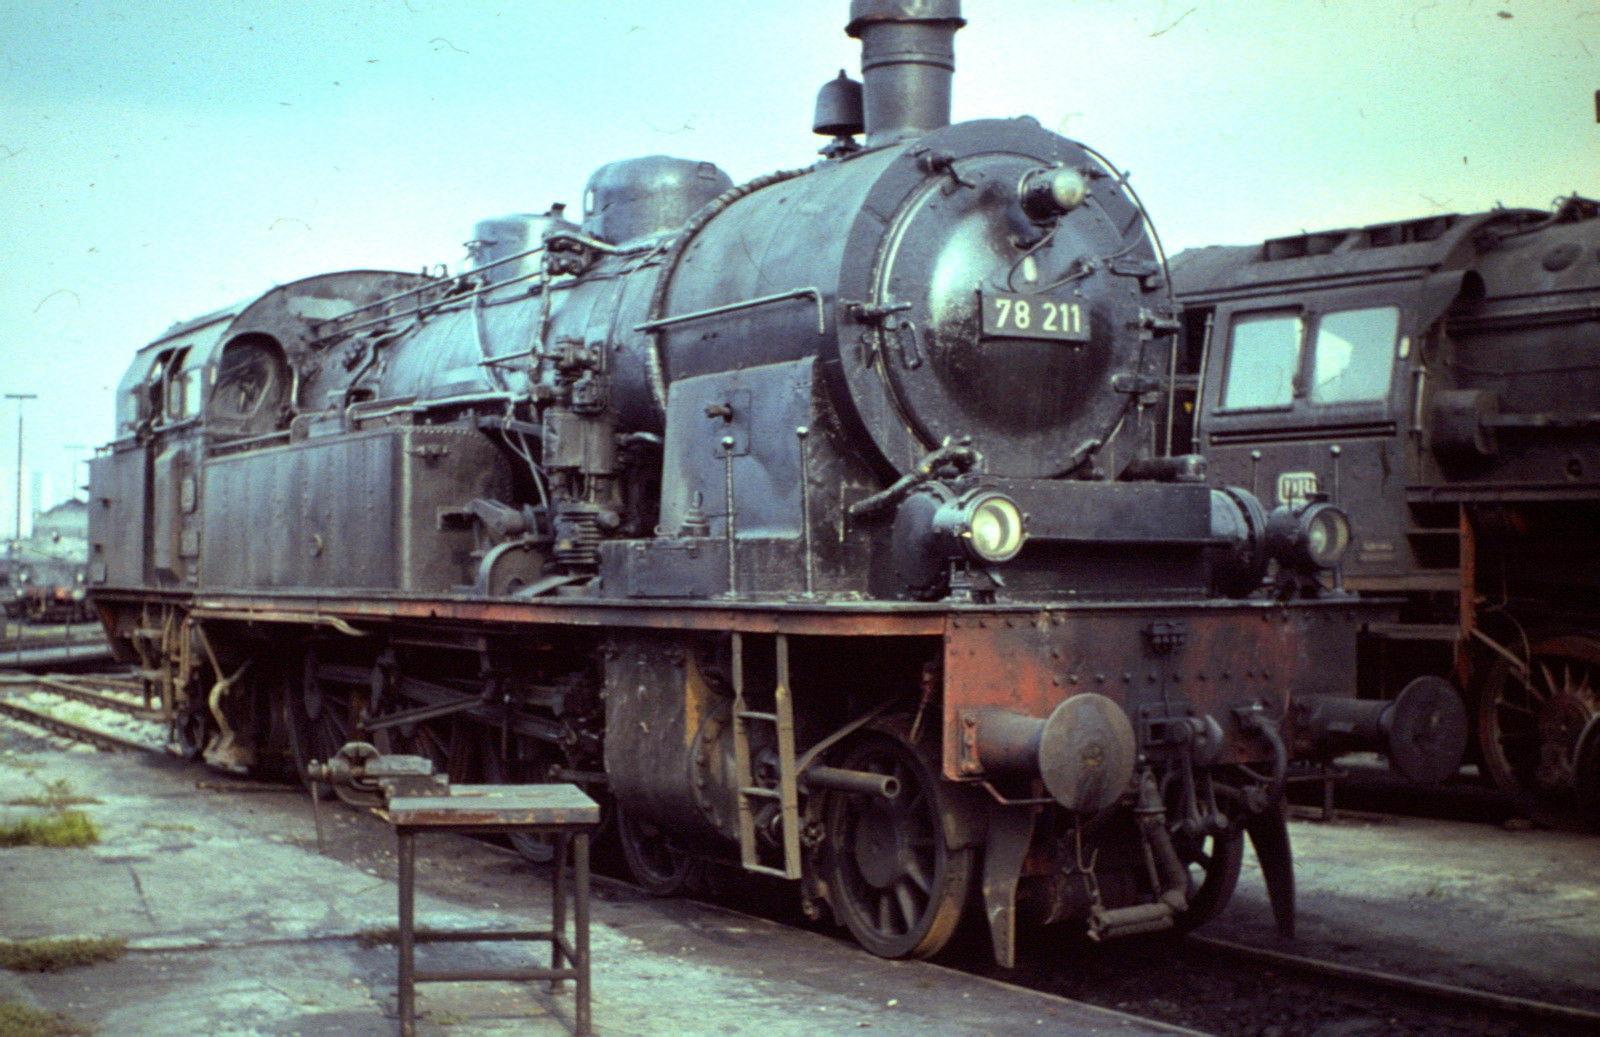 78211 1967 in Schweinfurt